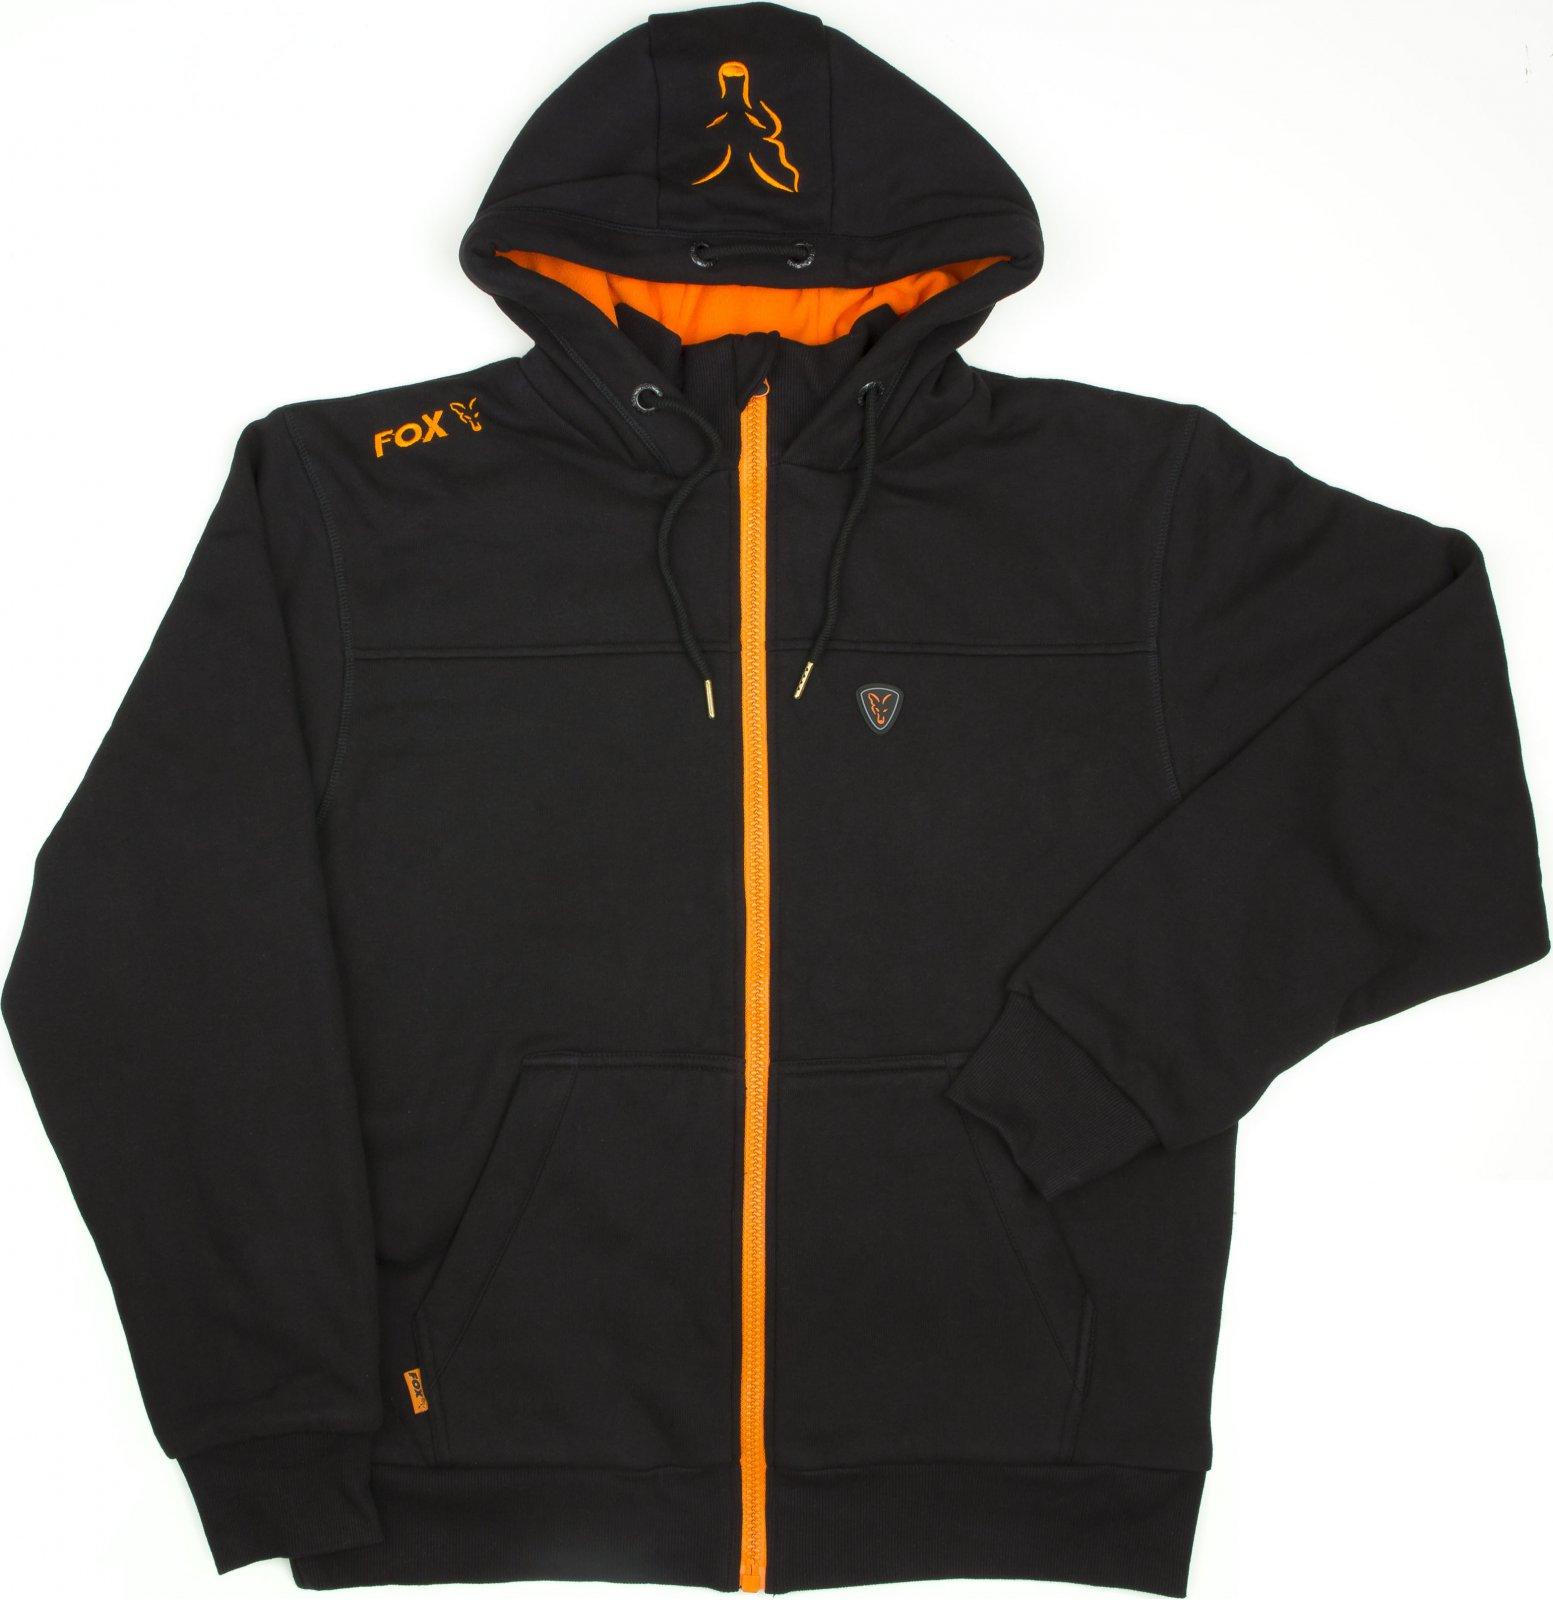 0c993fdeabc Fox Heavy Lined Hoody Black Orange od 1 359 Kč • Zboží.cz